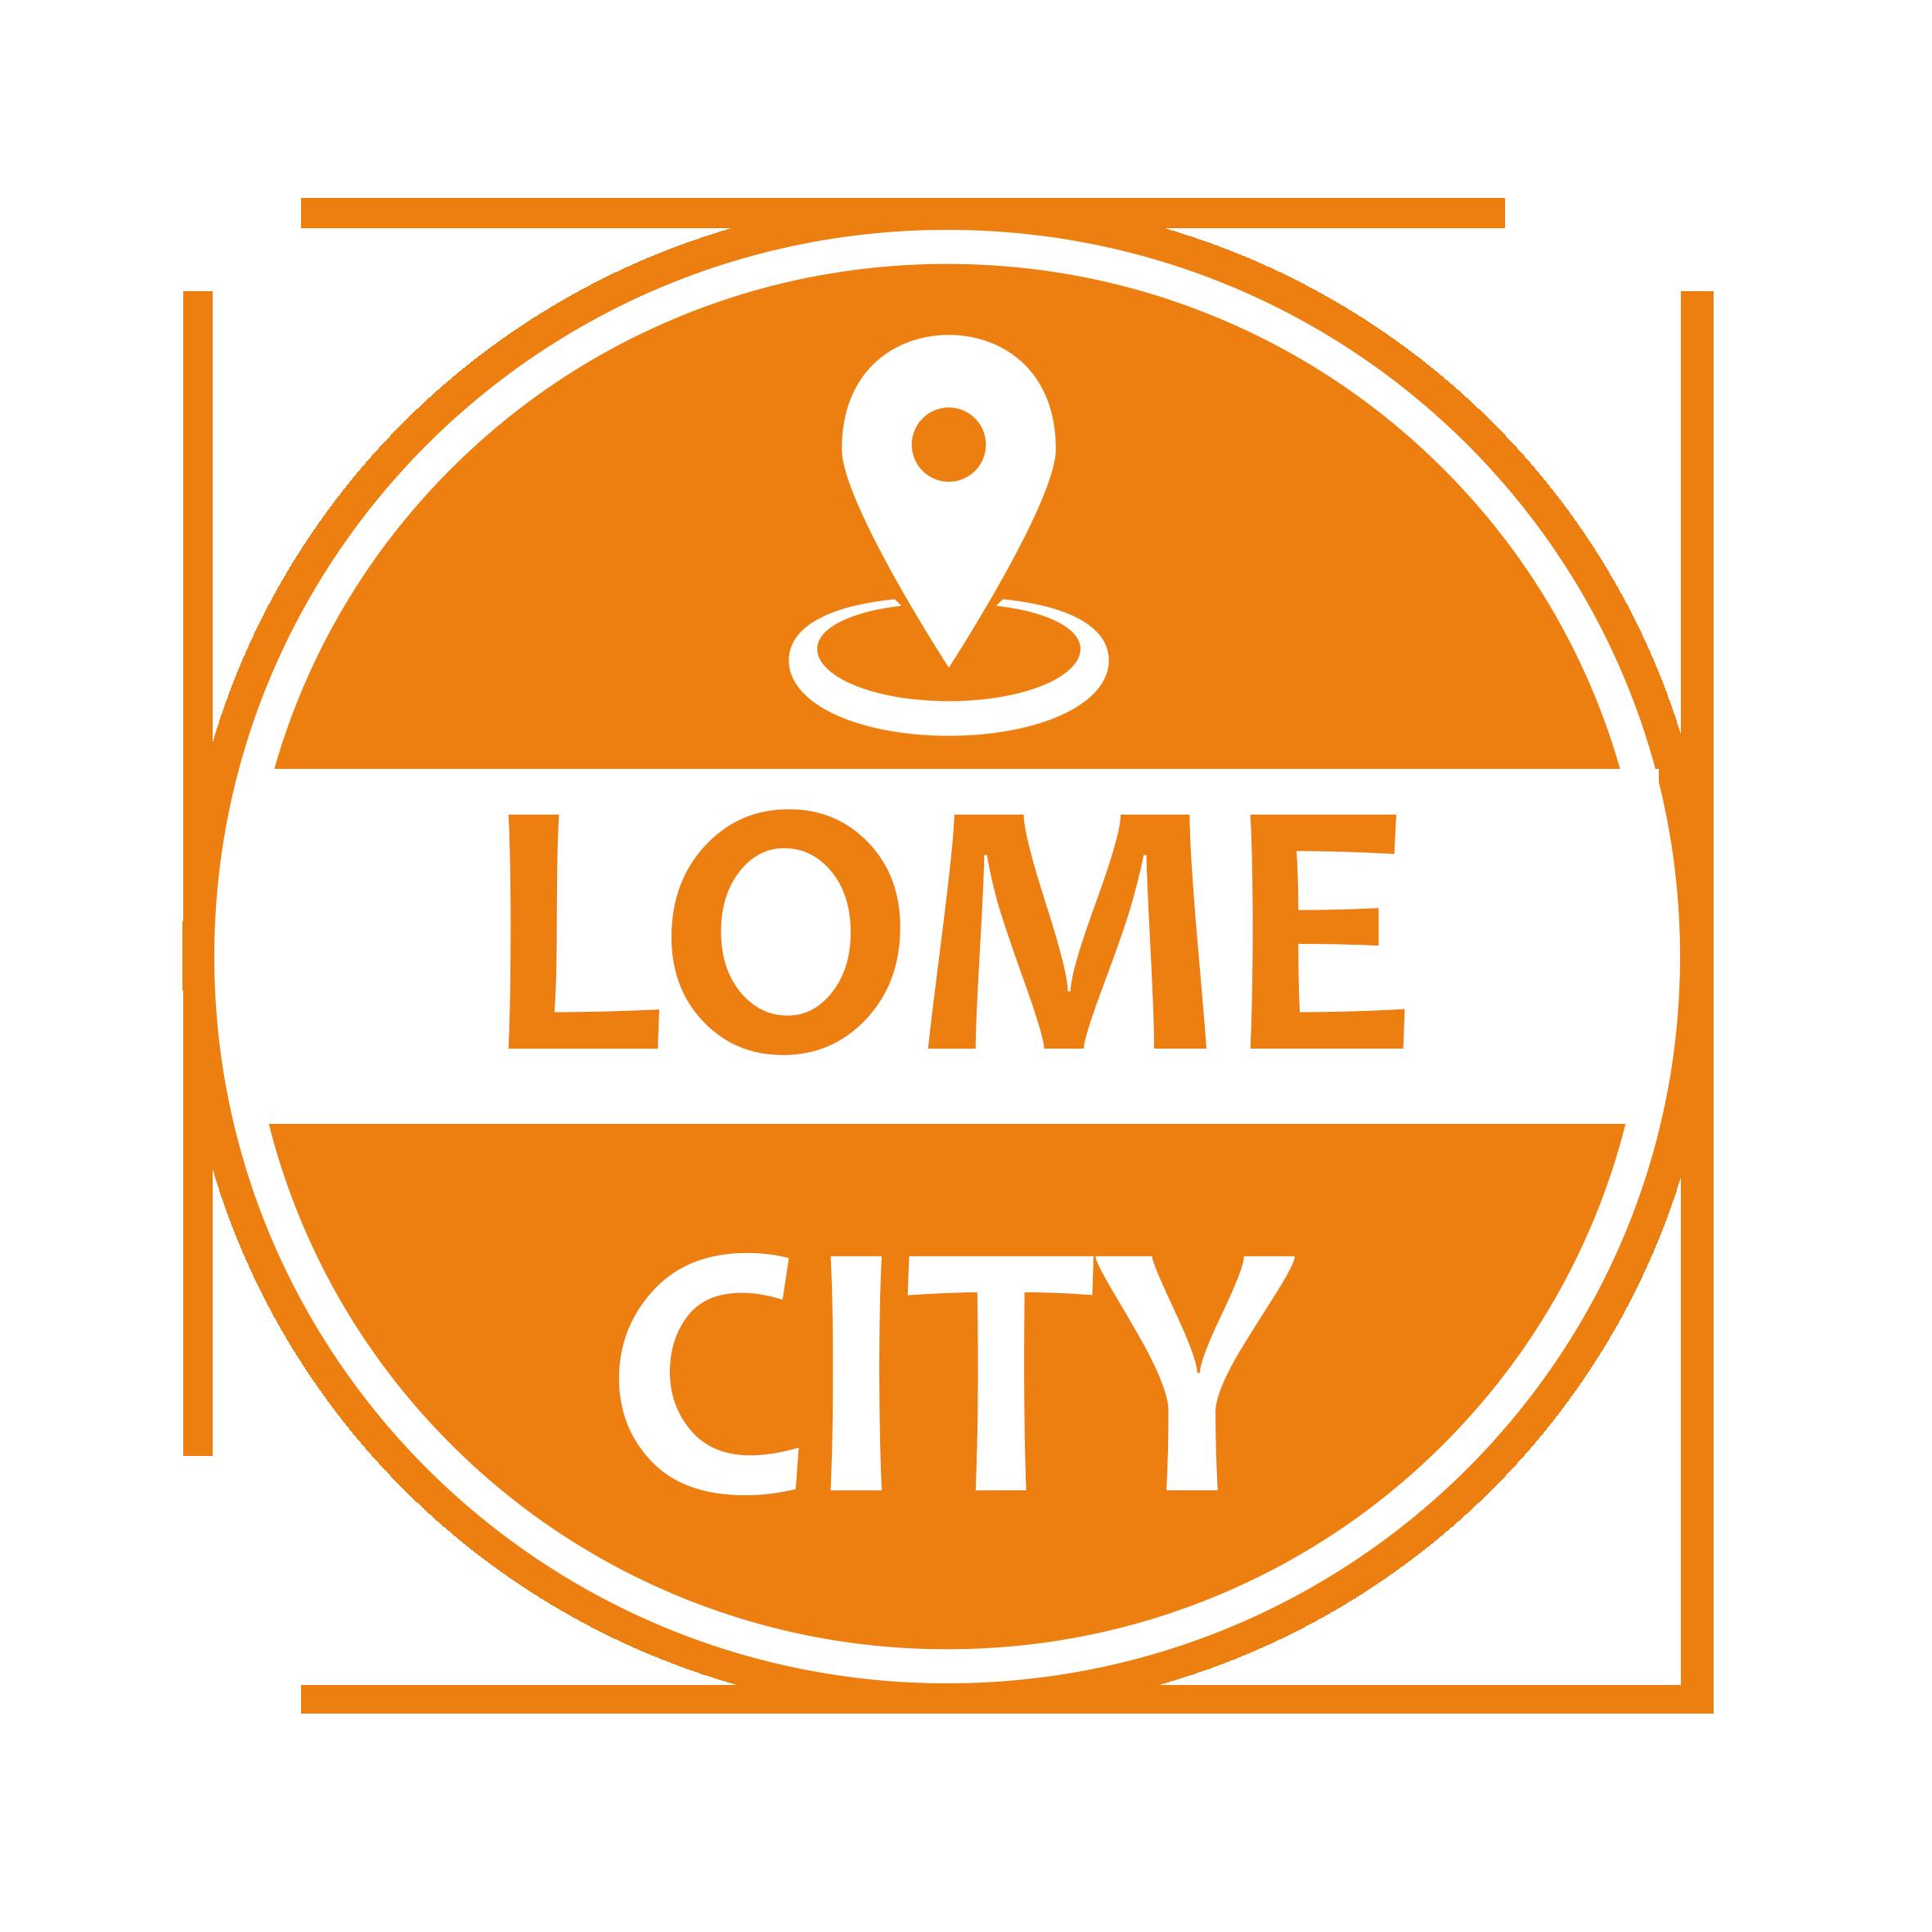 LOME CITY